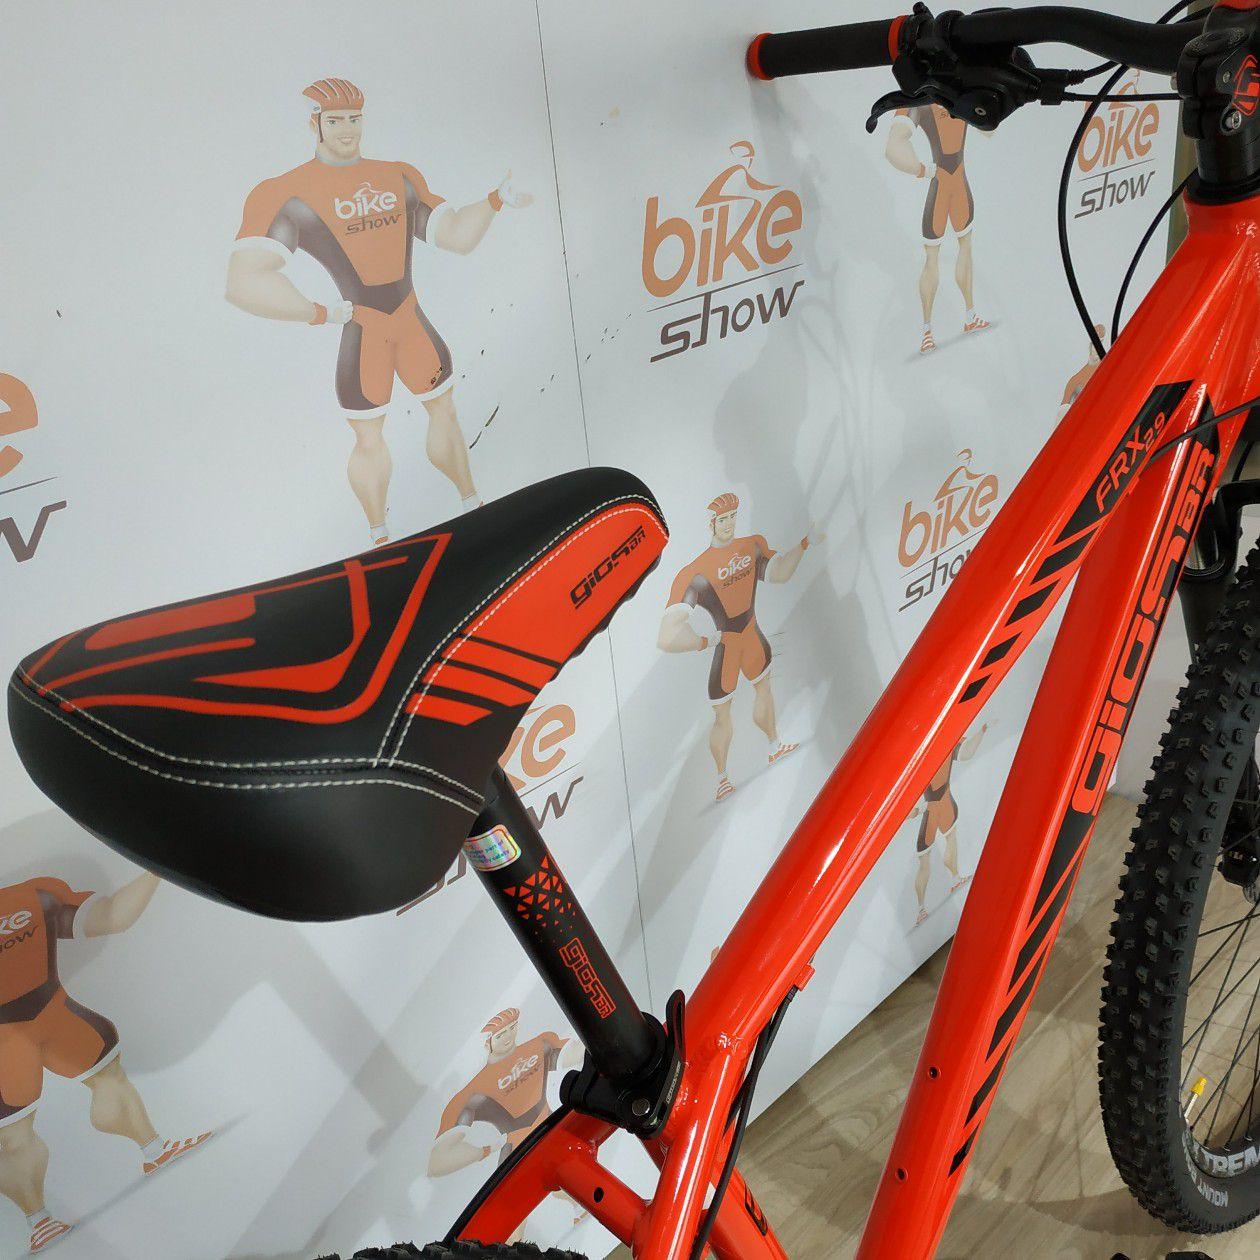 Bicicleta GIOS FRX aro 29 Freeride - 24v GTA Alumínio - Freio GTA Hidráulico - Suspensão MODE trava no ombro